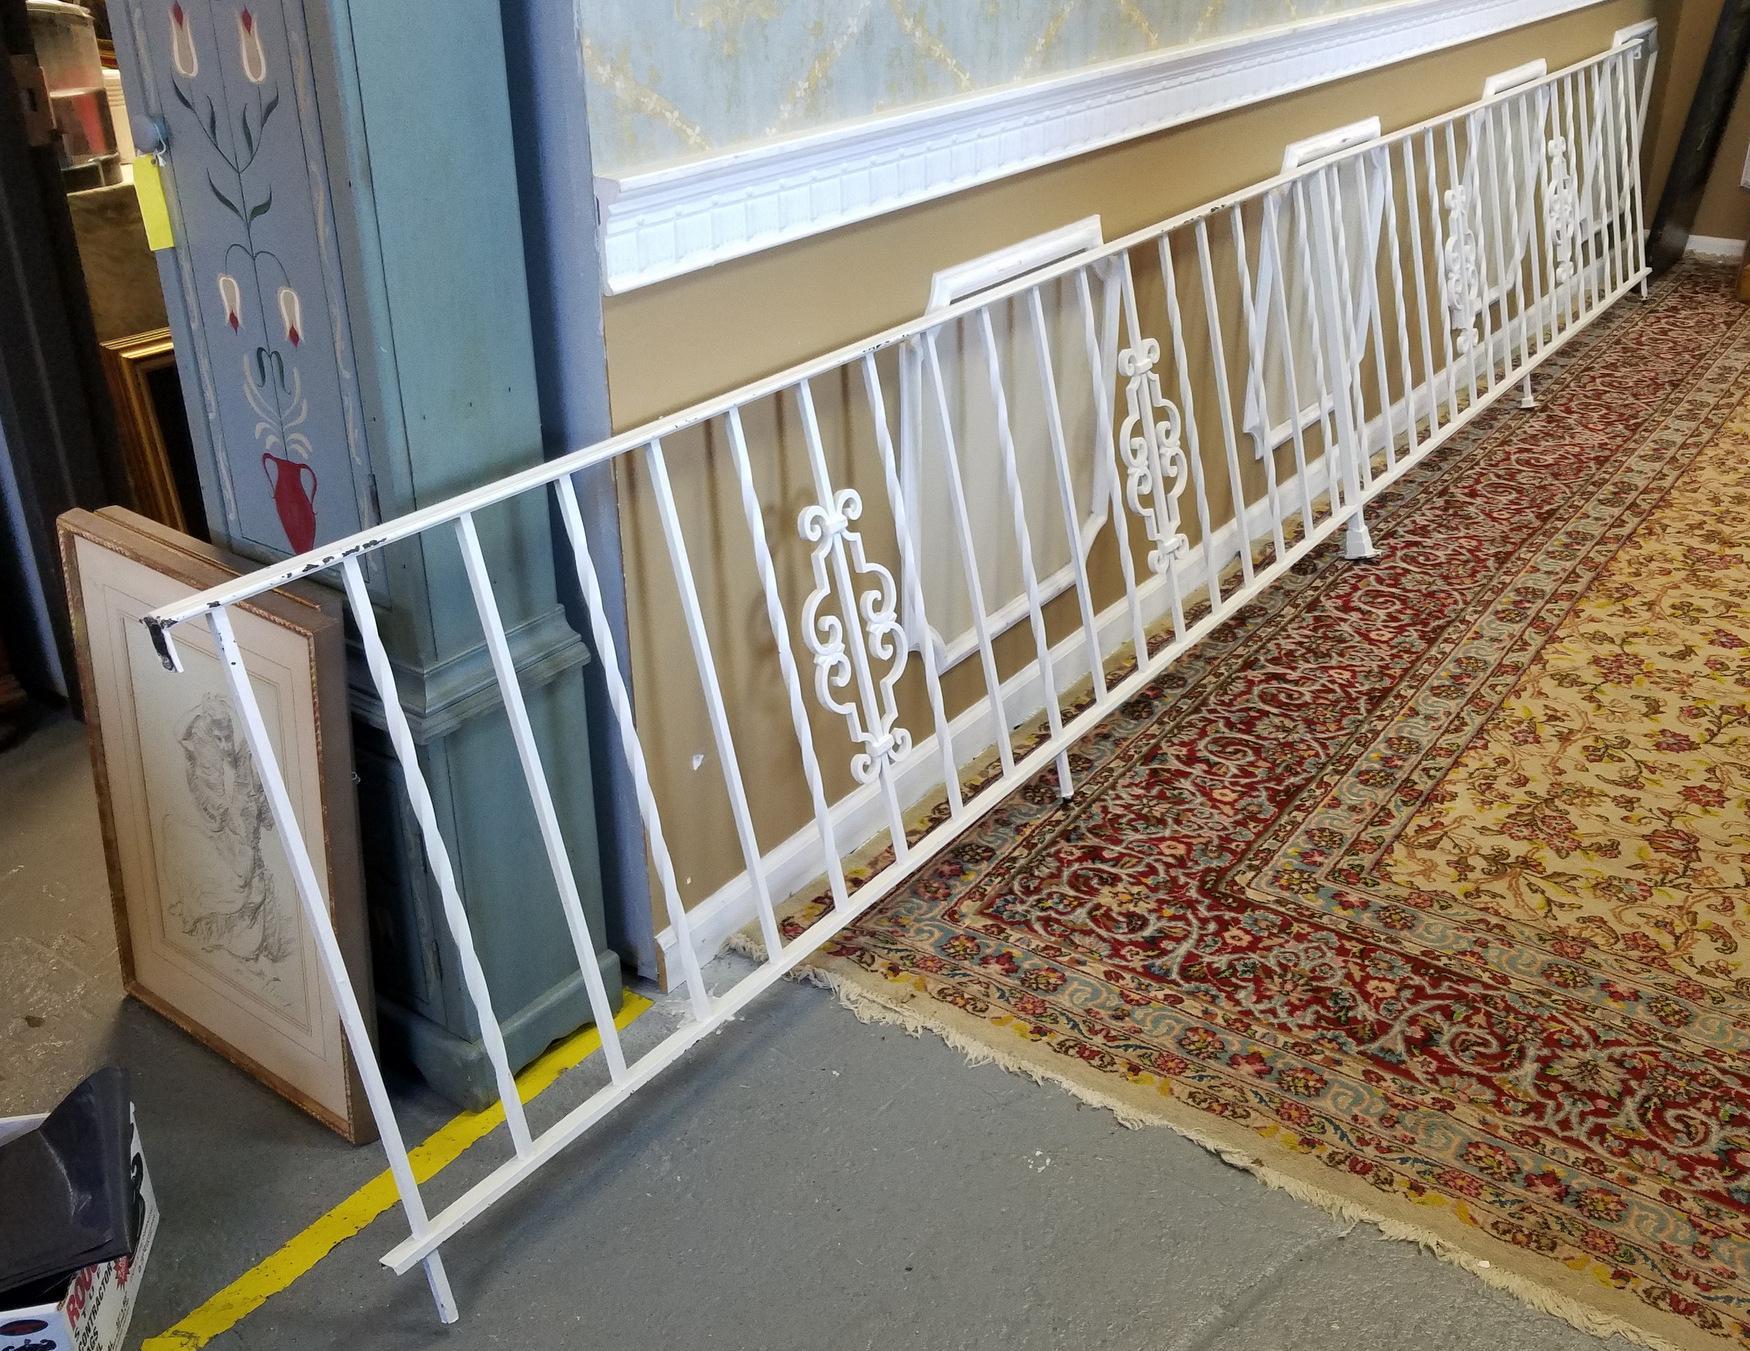 1950s vintage white wrought iron handrail railing gate image 2 of 9